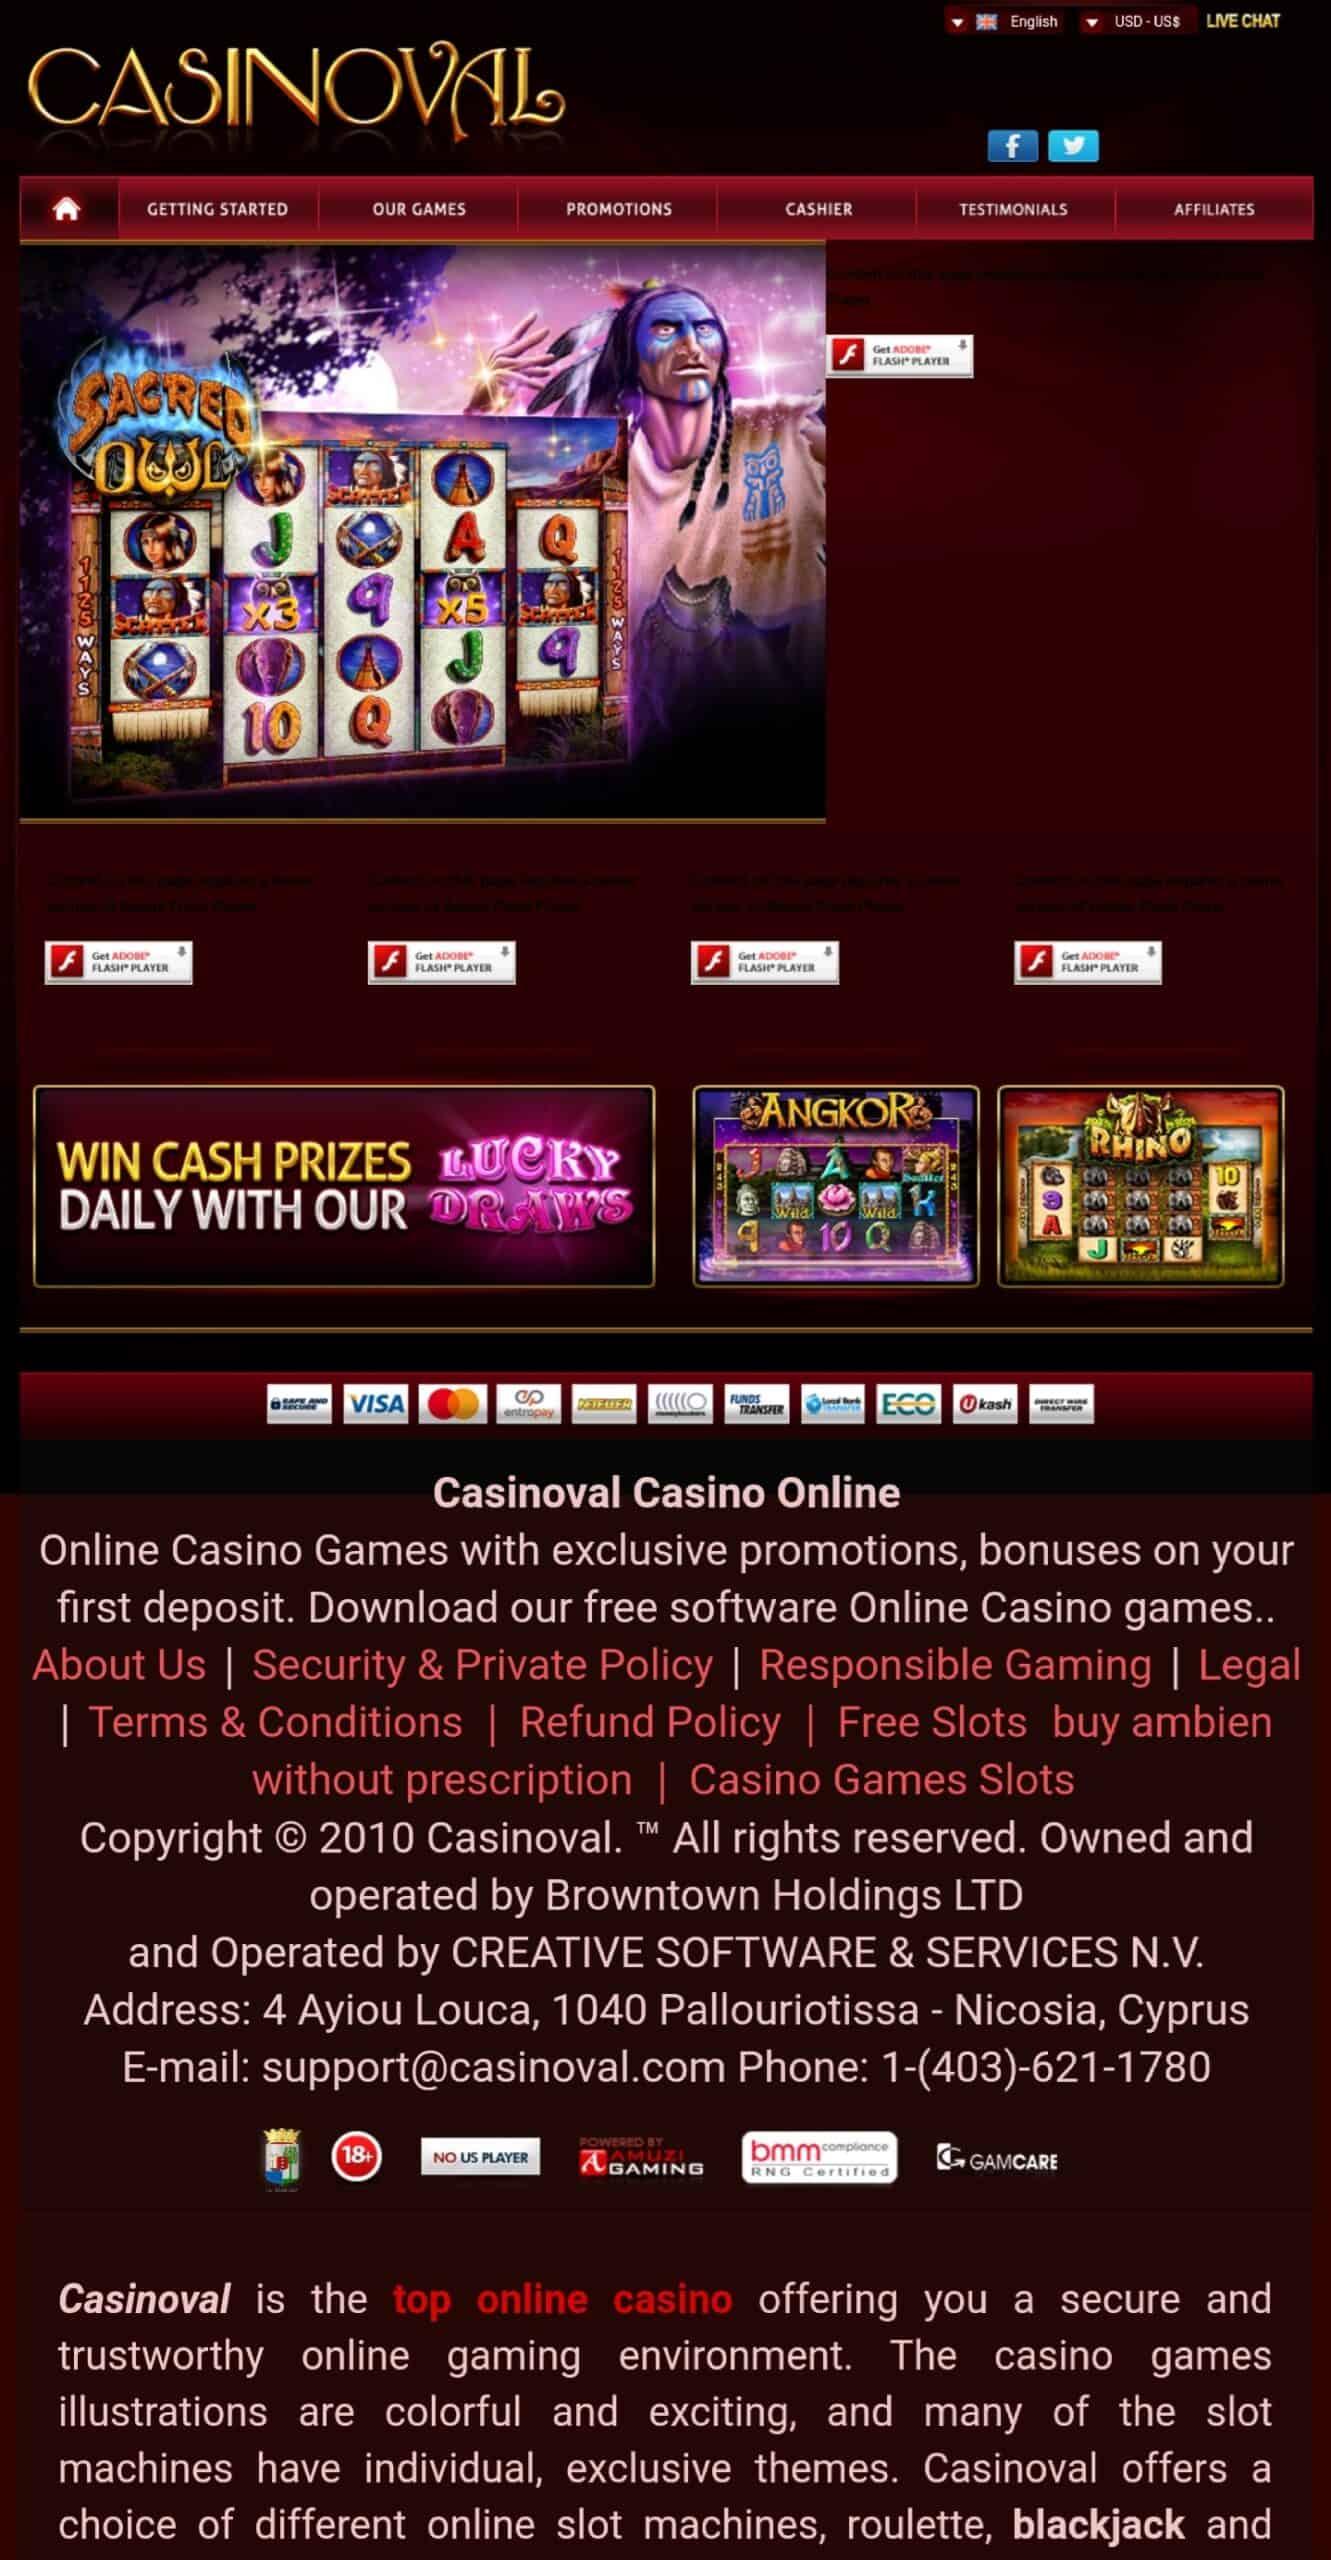 Casino Val